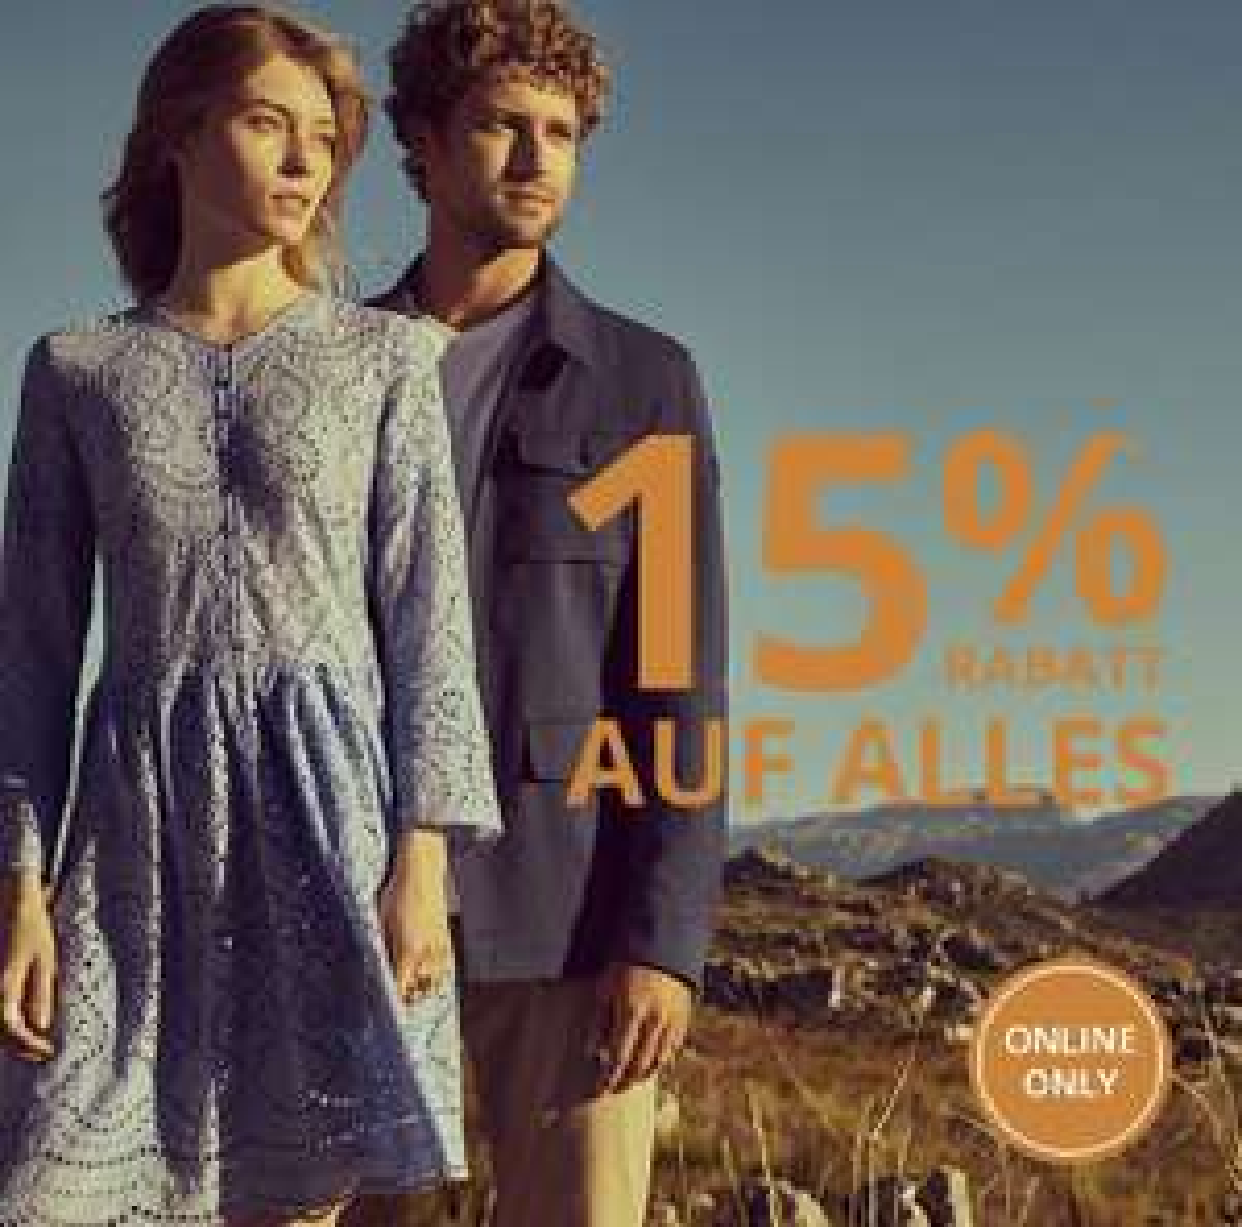 Peek & Cloppenburg: 15% Rabatt auf alles inklusive Sale